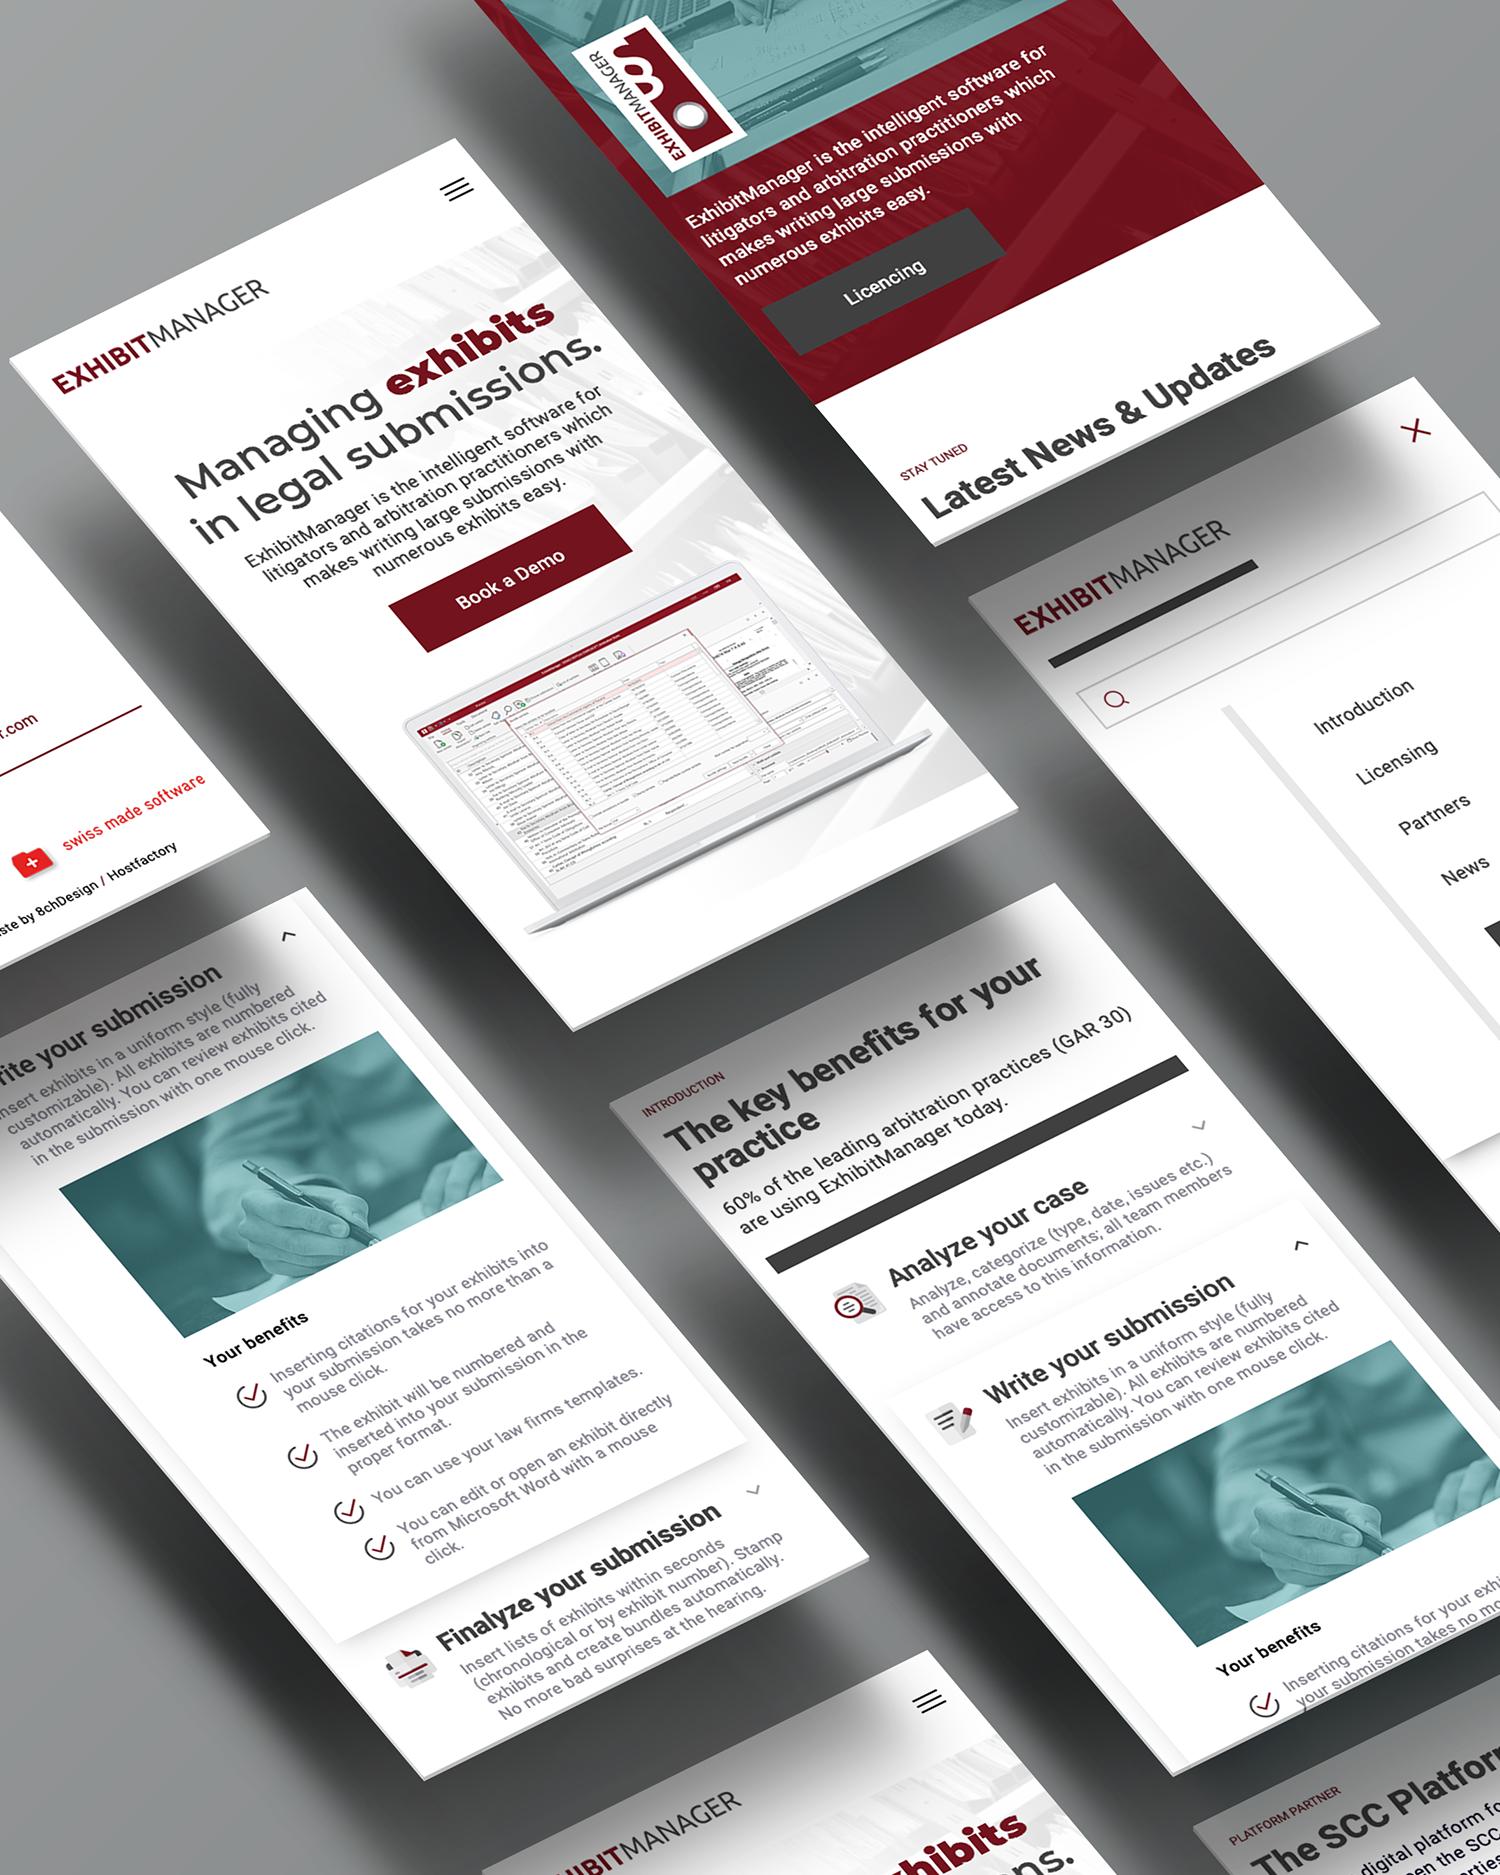 Individuelles mobile WordPress Webdesign - Jurist, Anwalt, Anwaltskanzlei